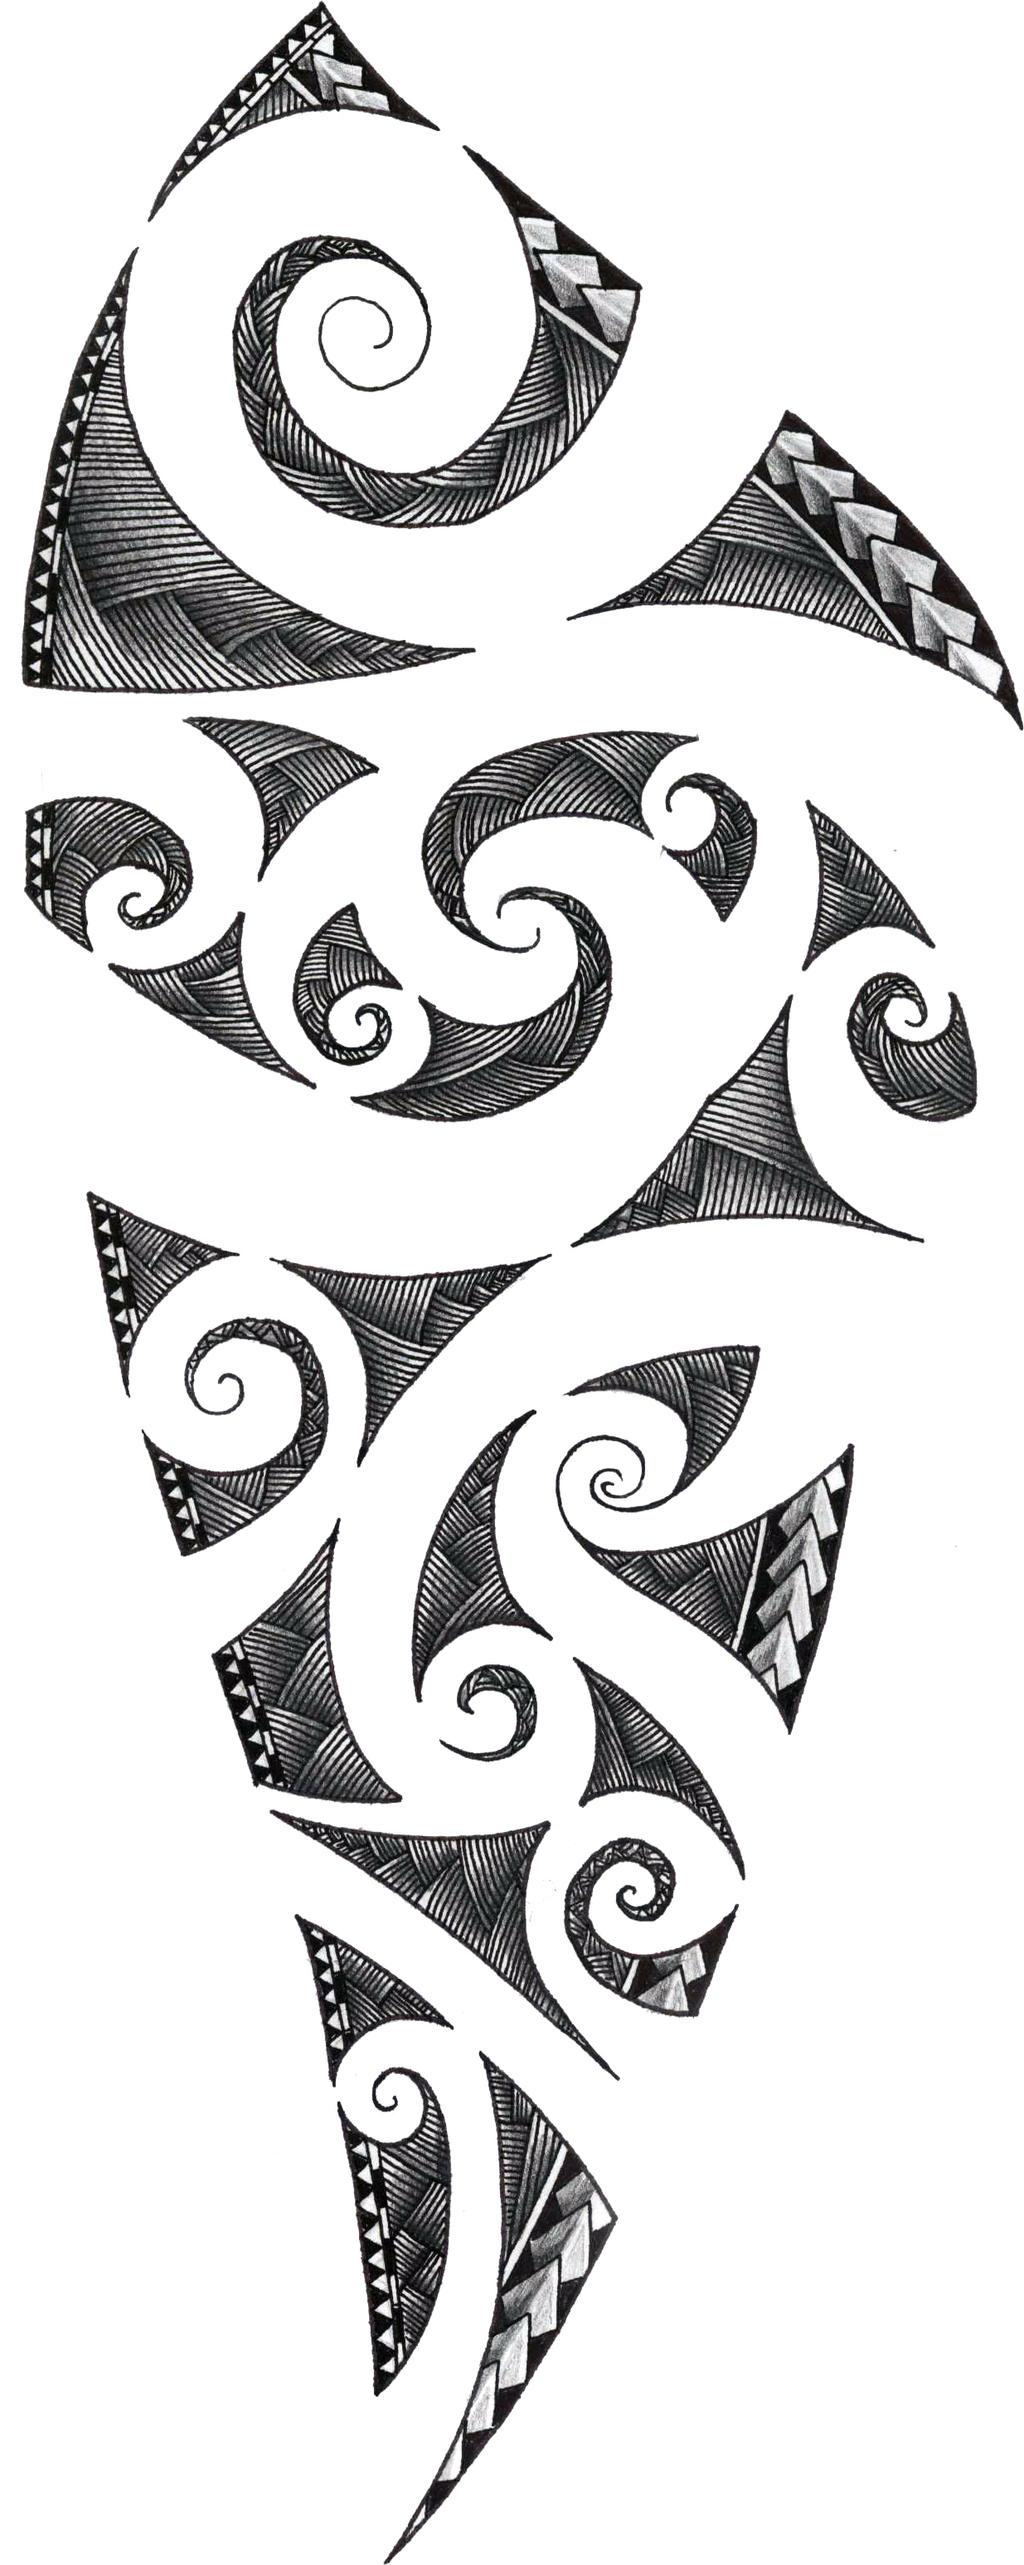 Maori Tattoo Design By ZakonKrancaSwiata On DeviantArt